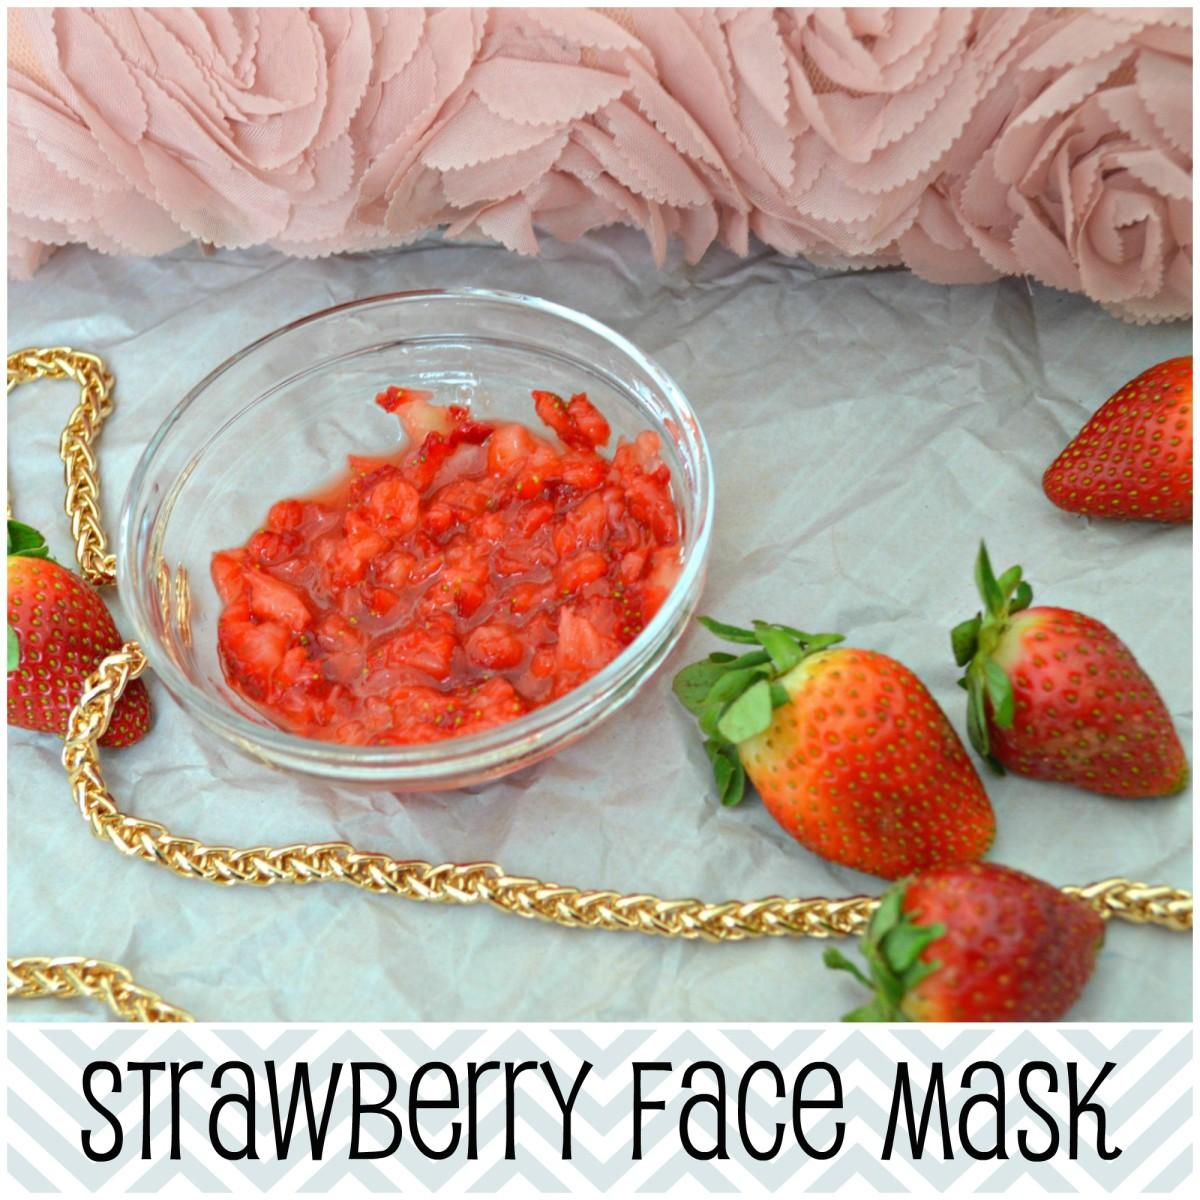 Beauty DIY: Strawberry Face Mask with Yogurt & Honey